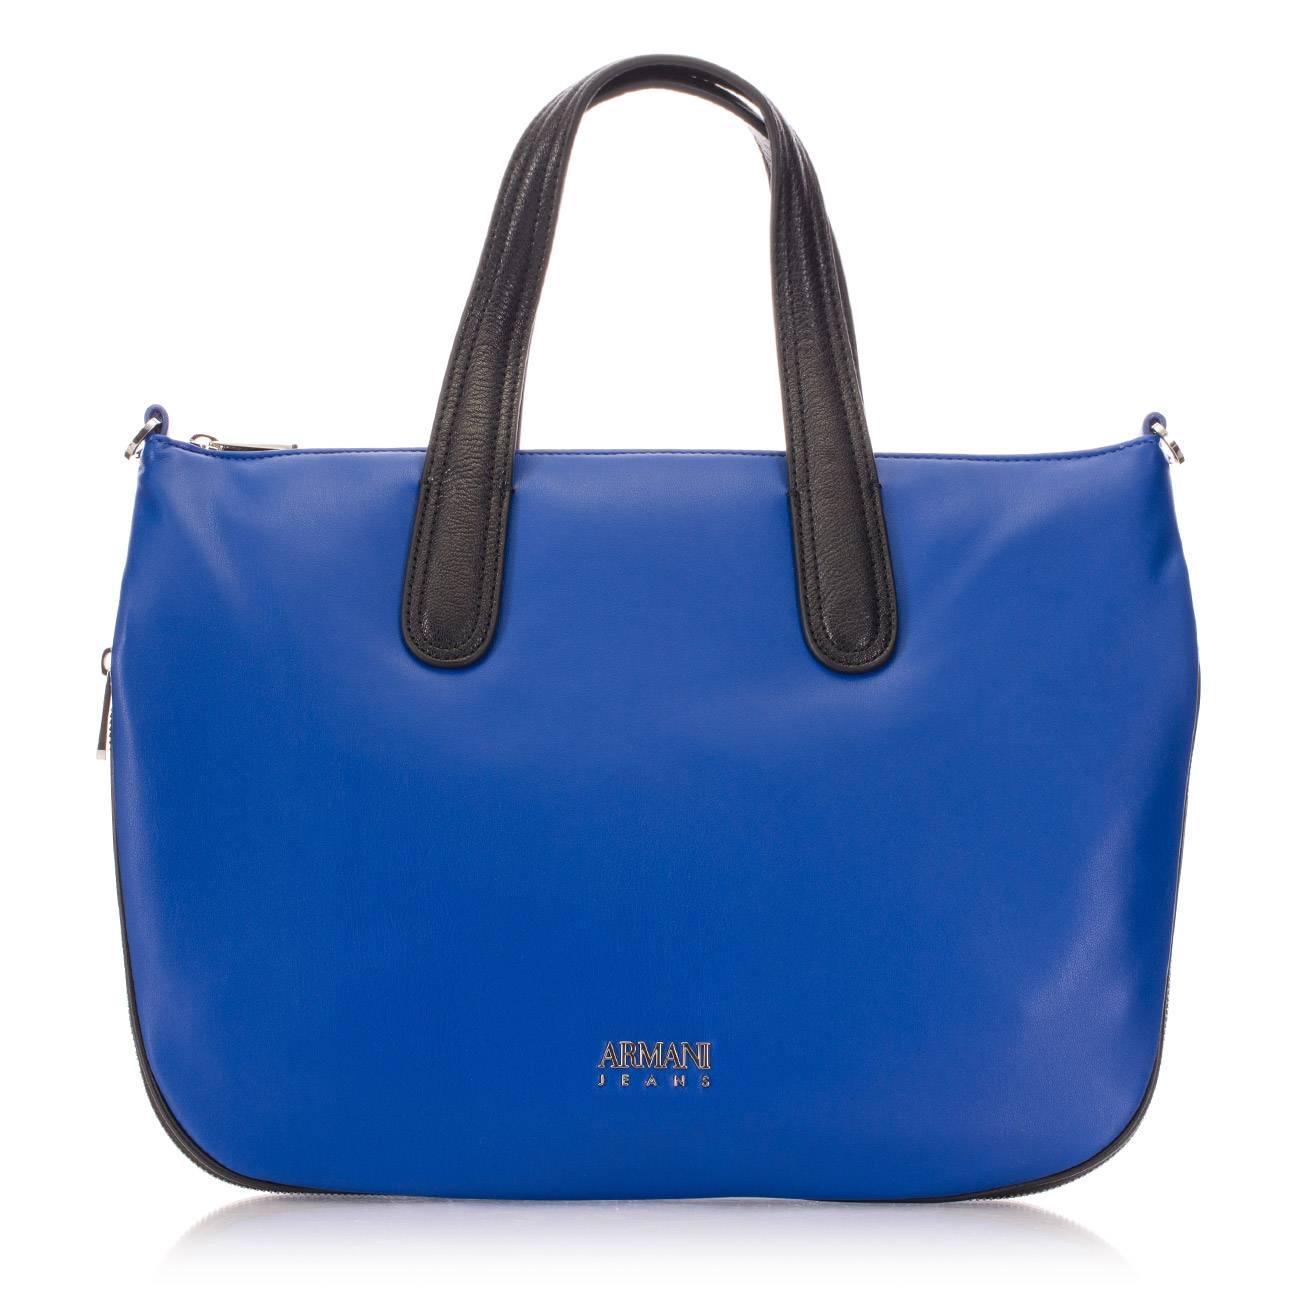 ROYAL BLUE SHOPPER BAG